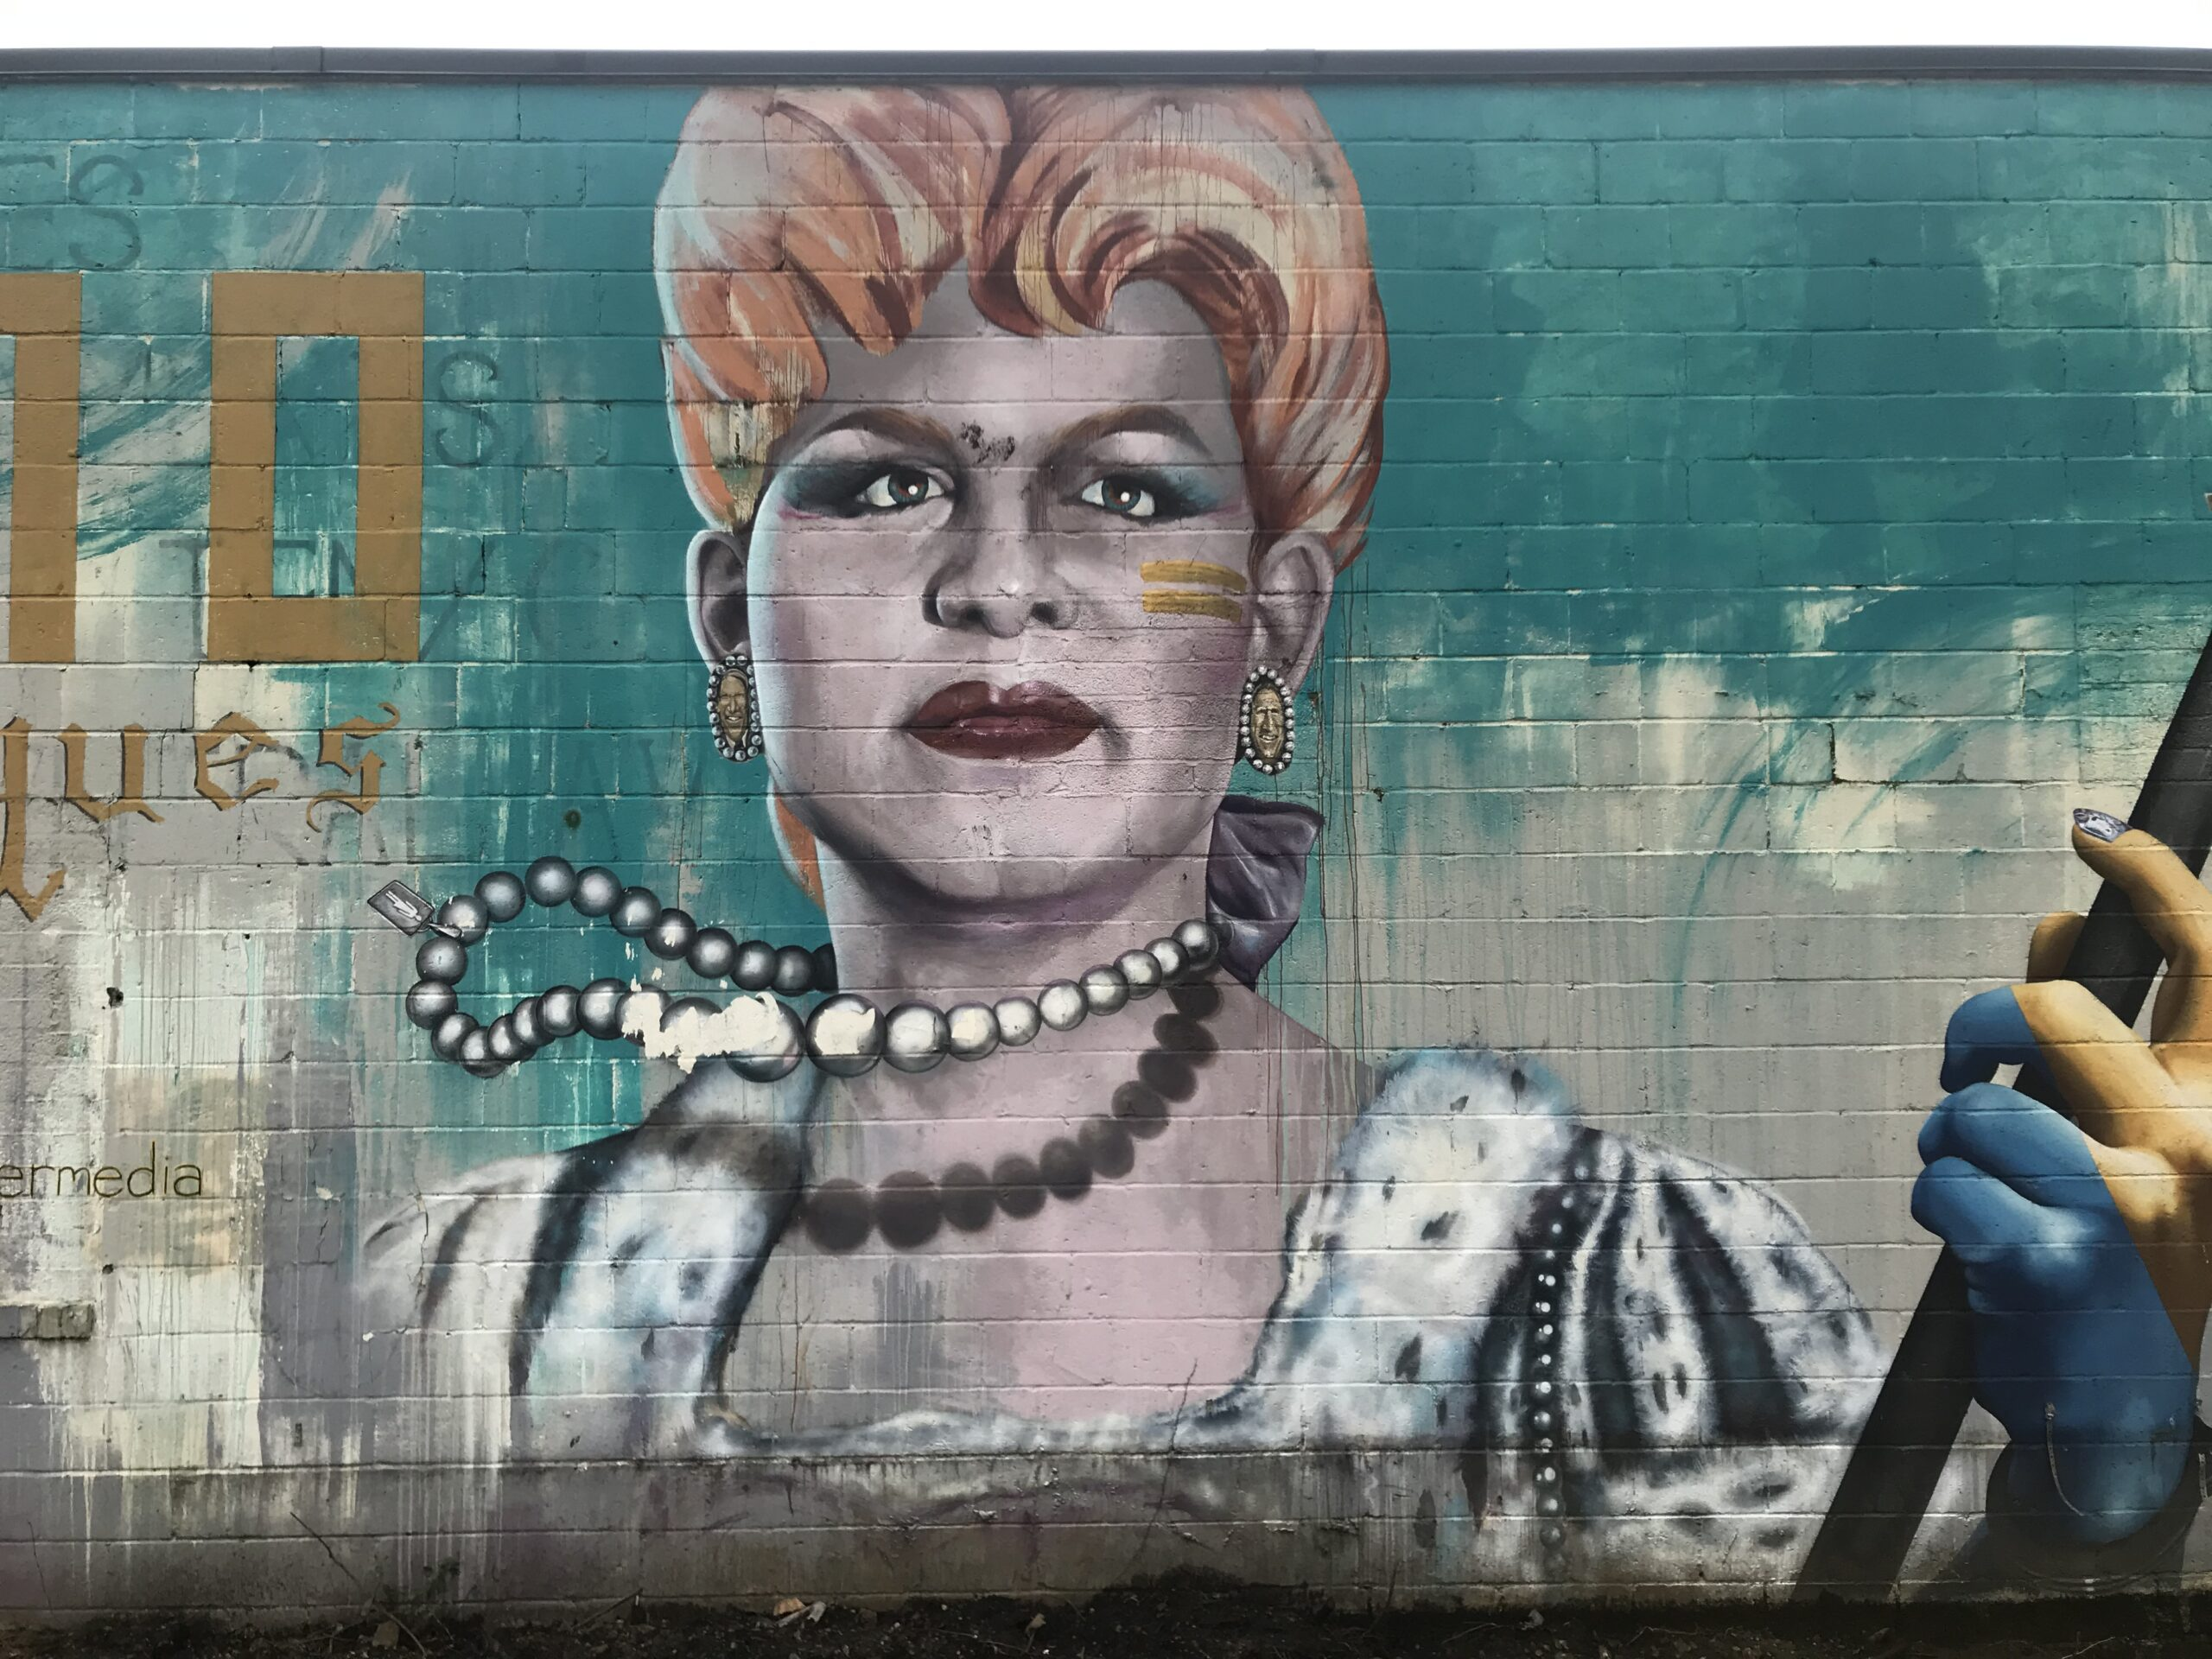 Plaza Midwood mural